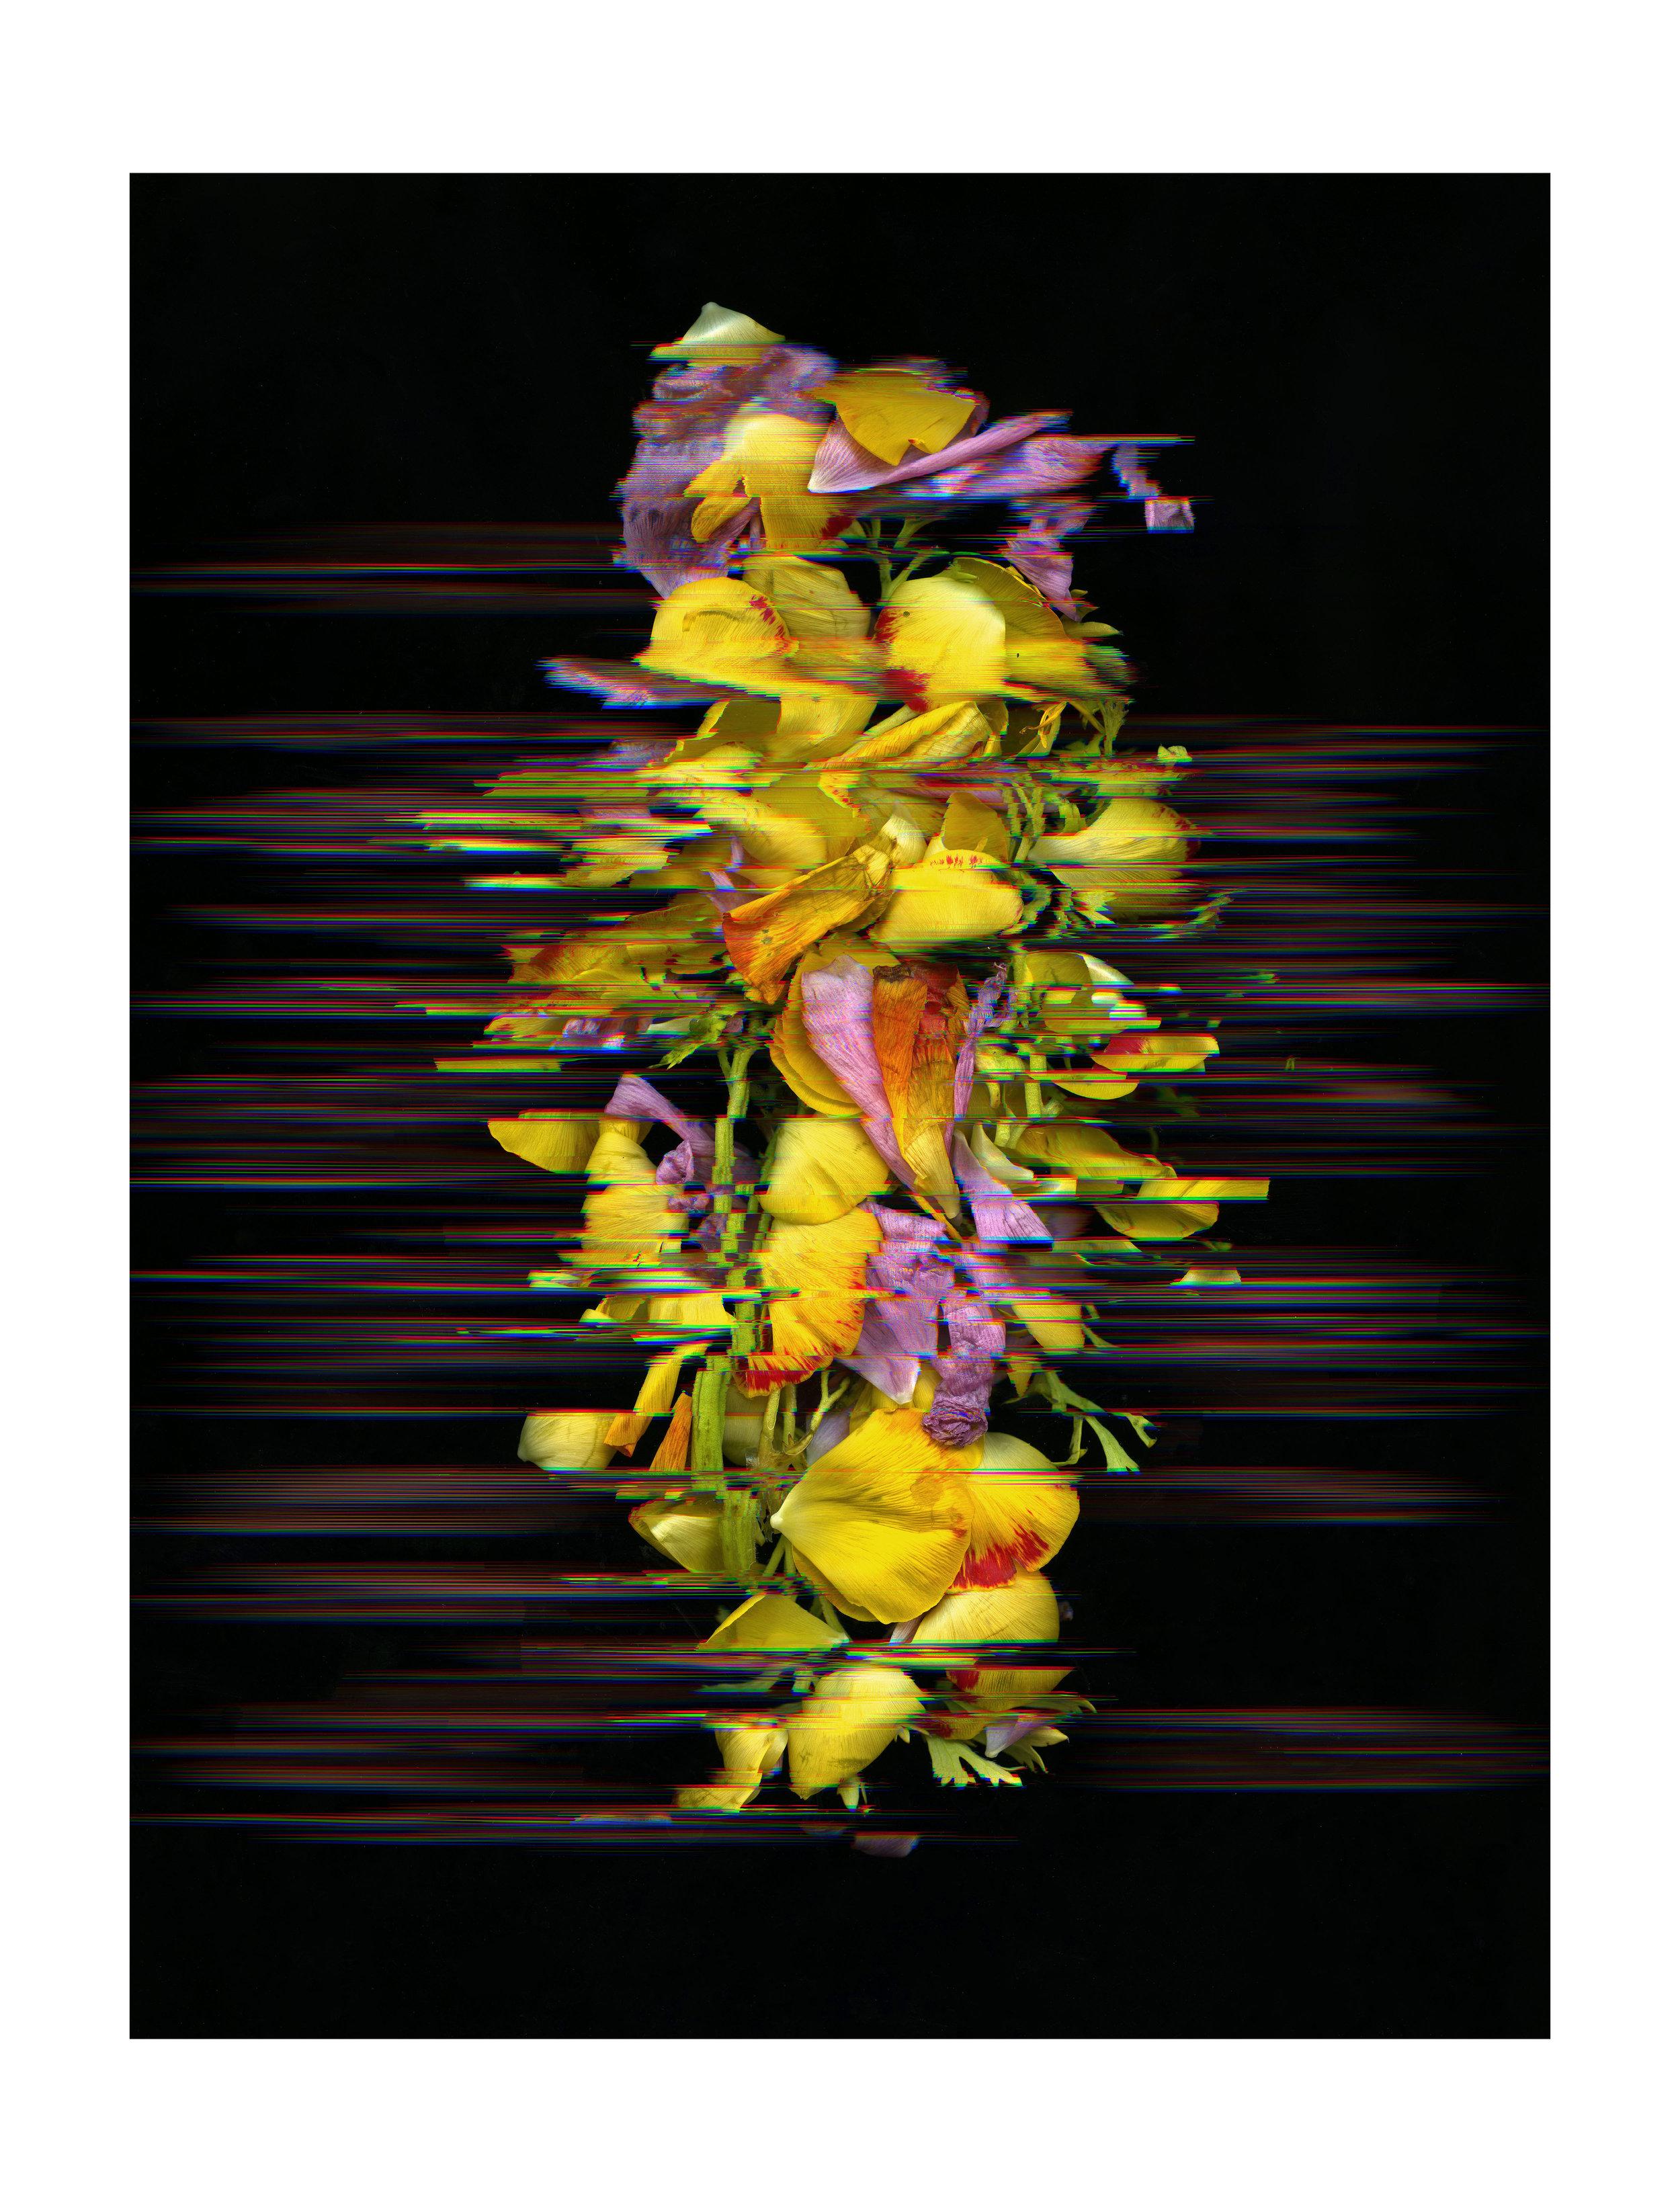 FlowerScan039editbordersmall.jpg